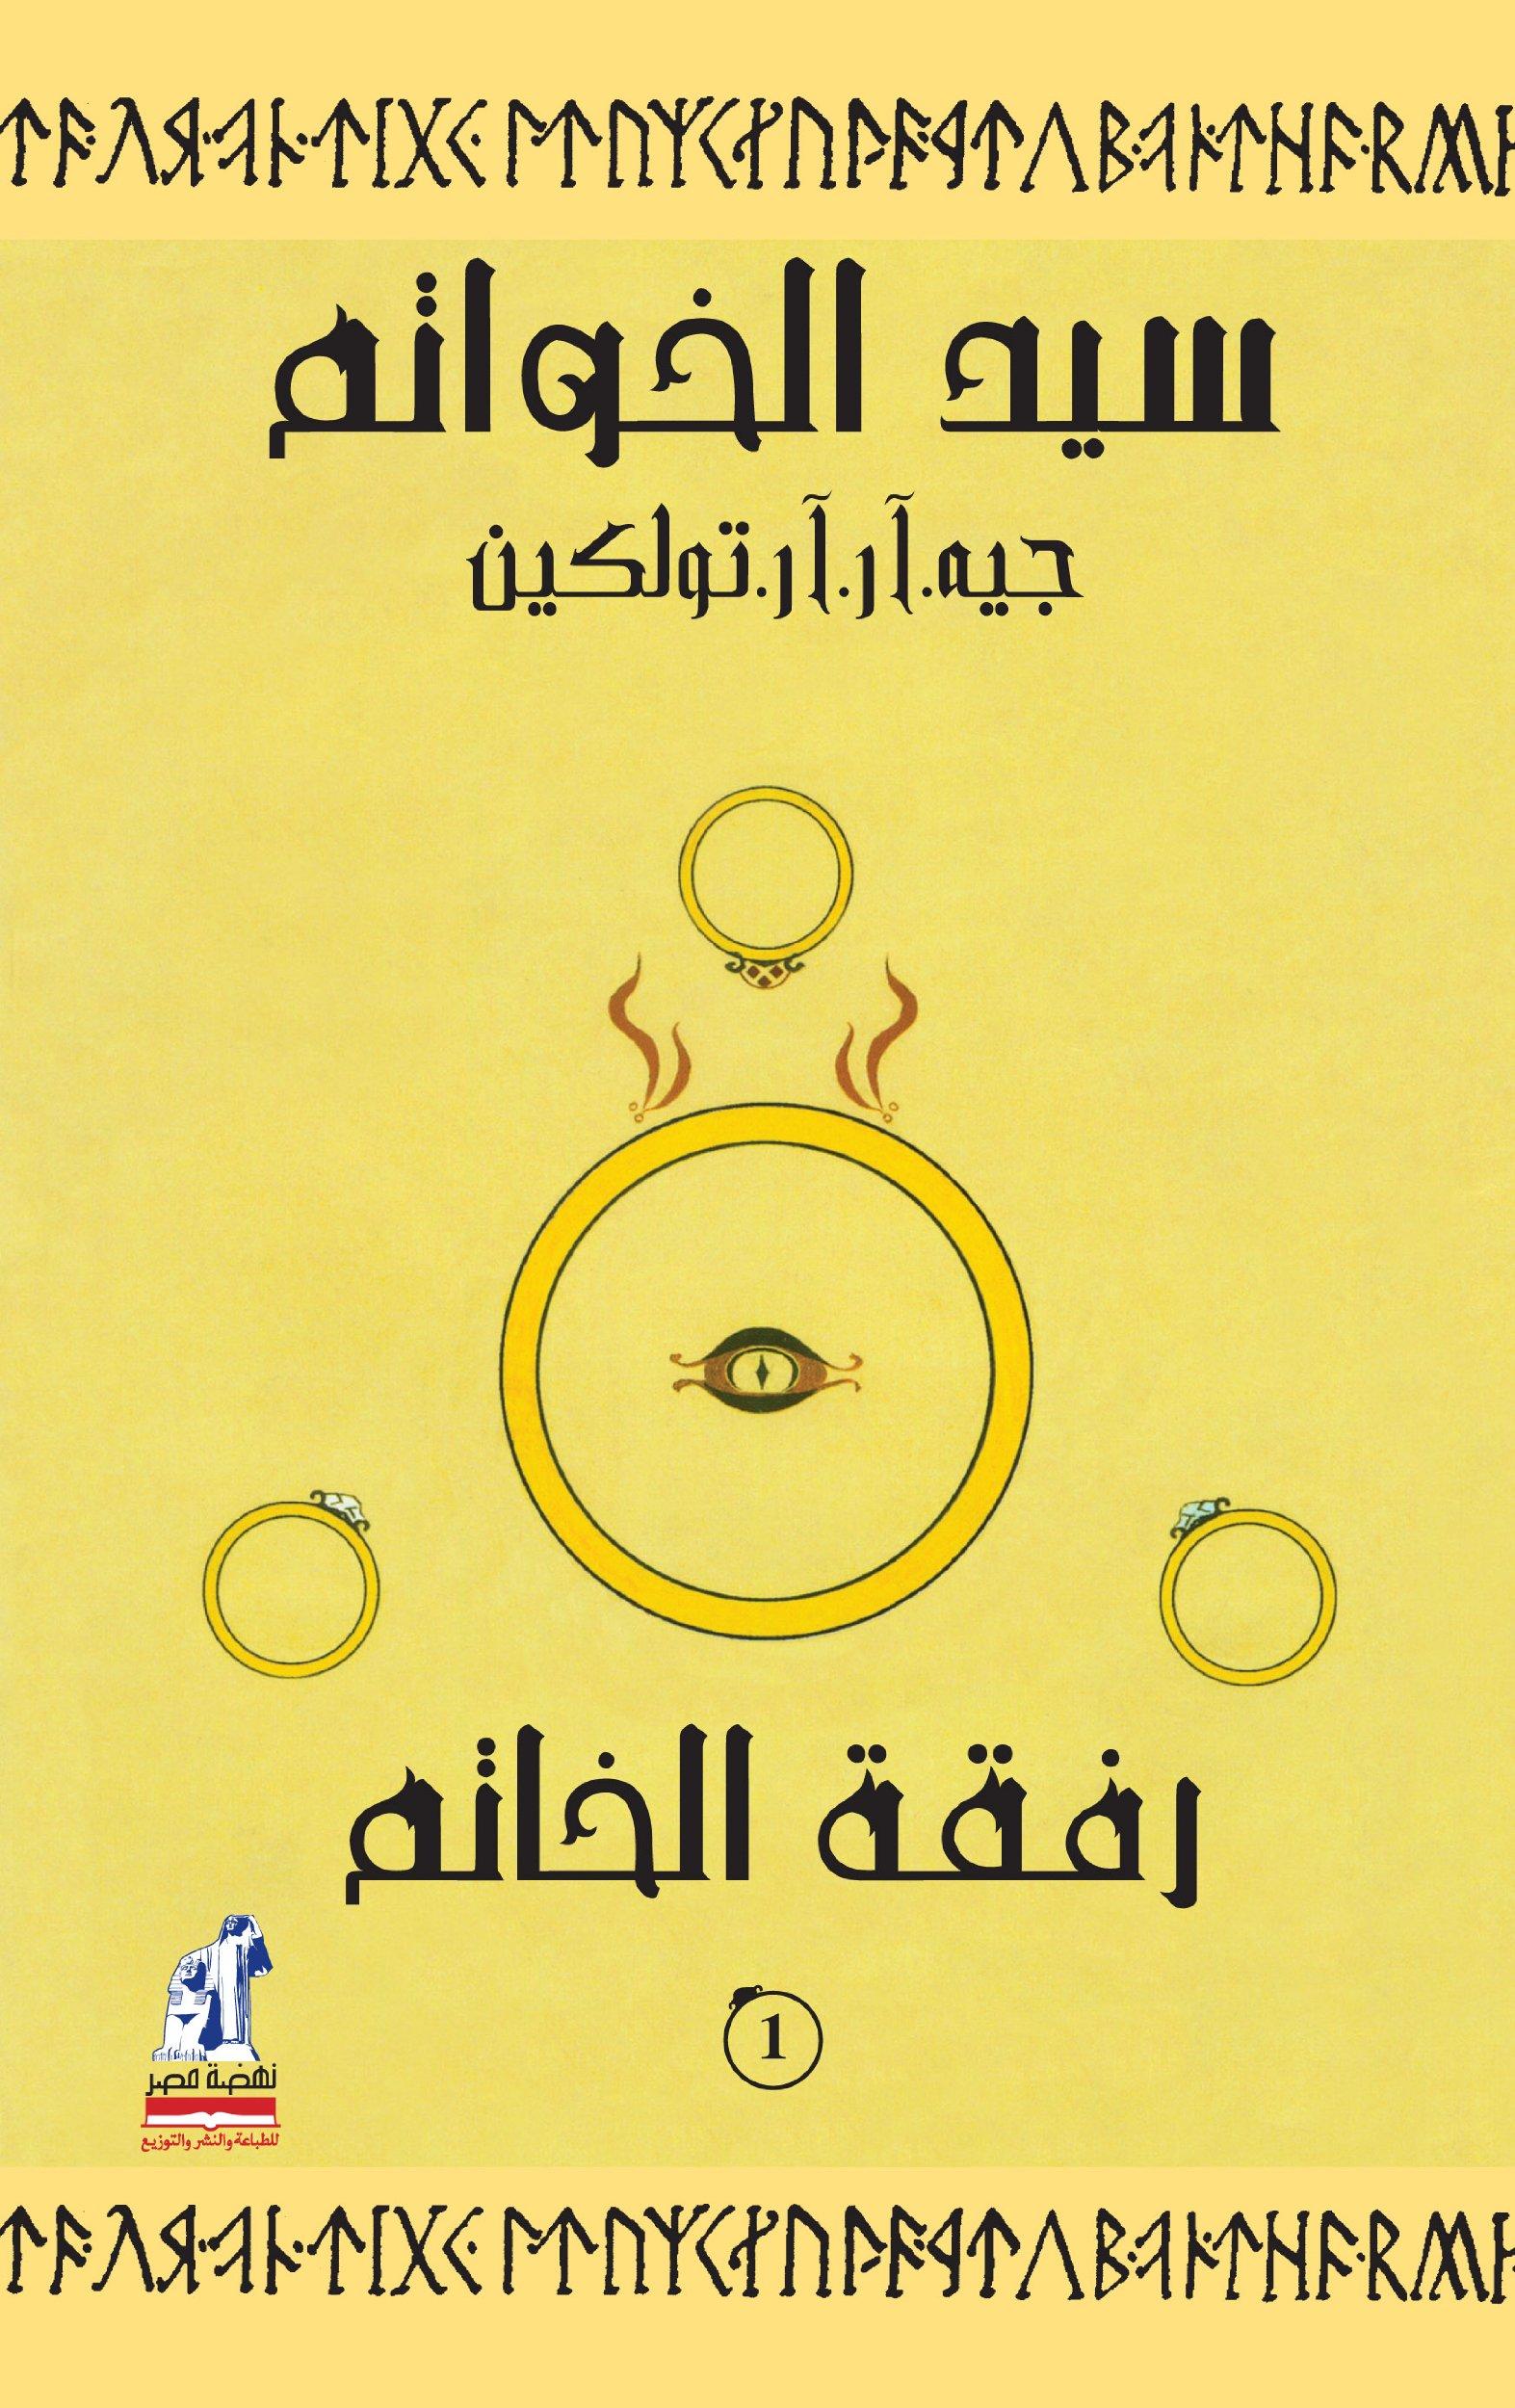 Photo of تحميل كتاب سيد الخواتم 1 PDF رفقة الخاتم